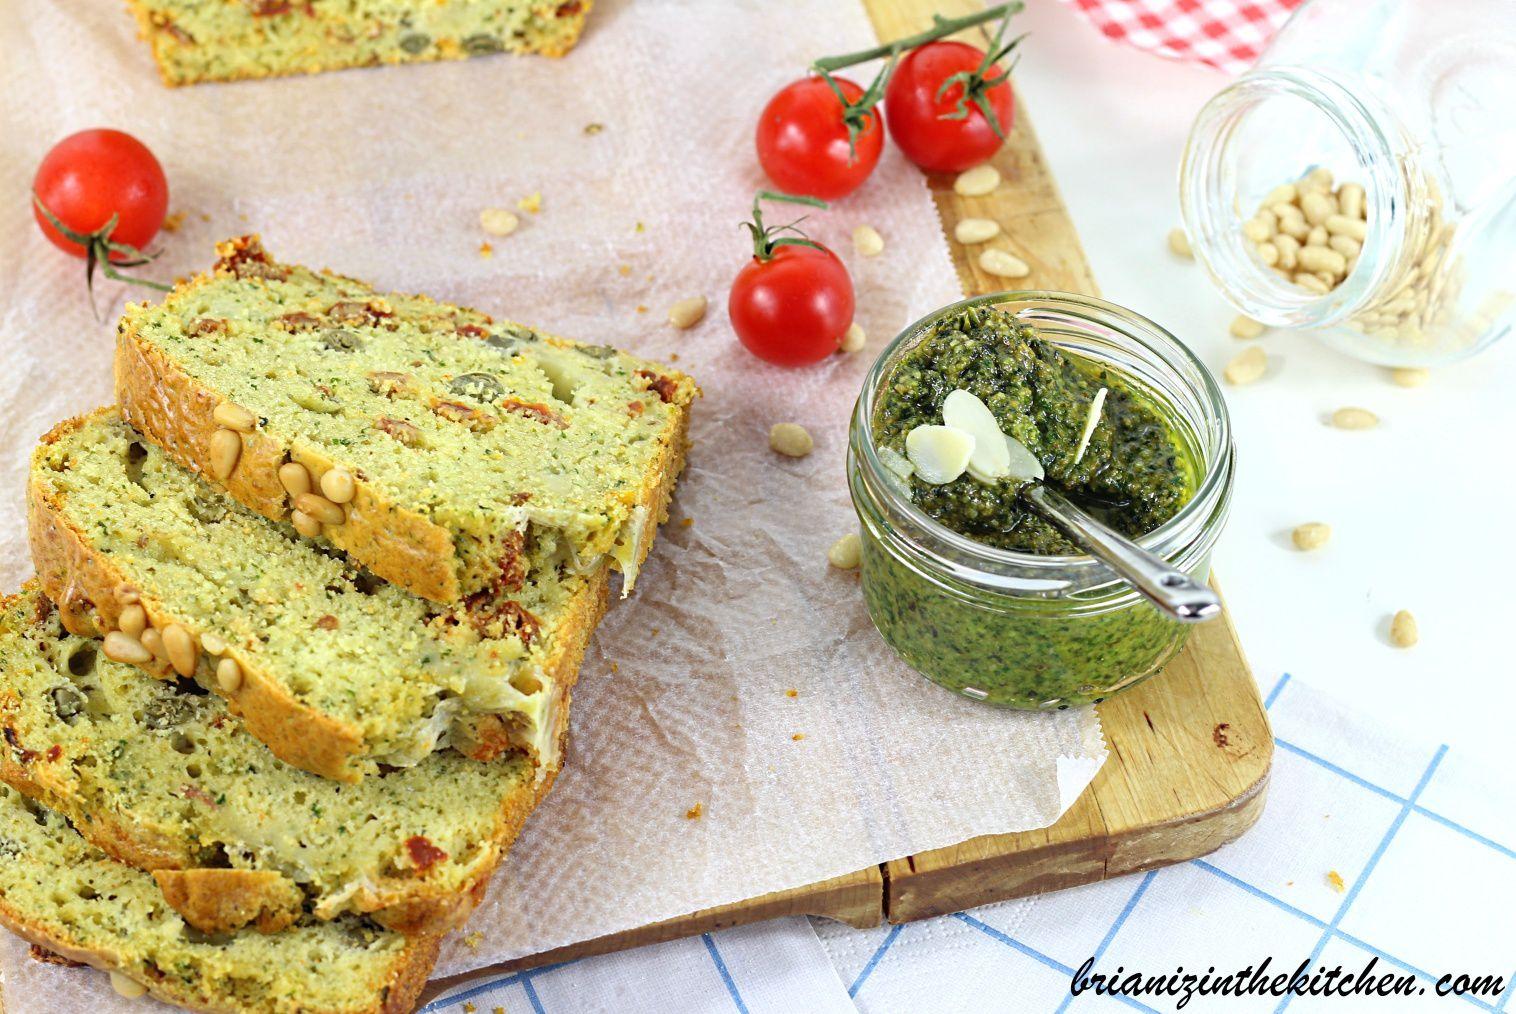 Cake au Pesto, Tomates Séchées & Câpres